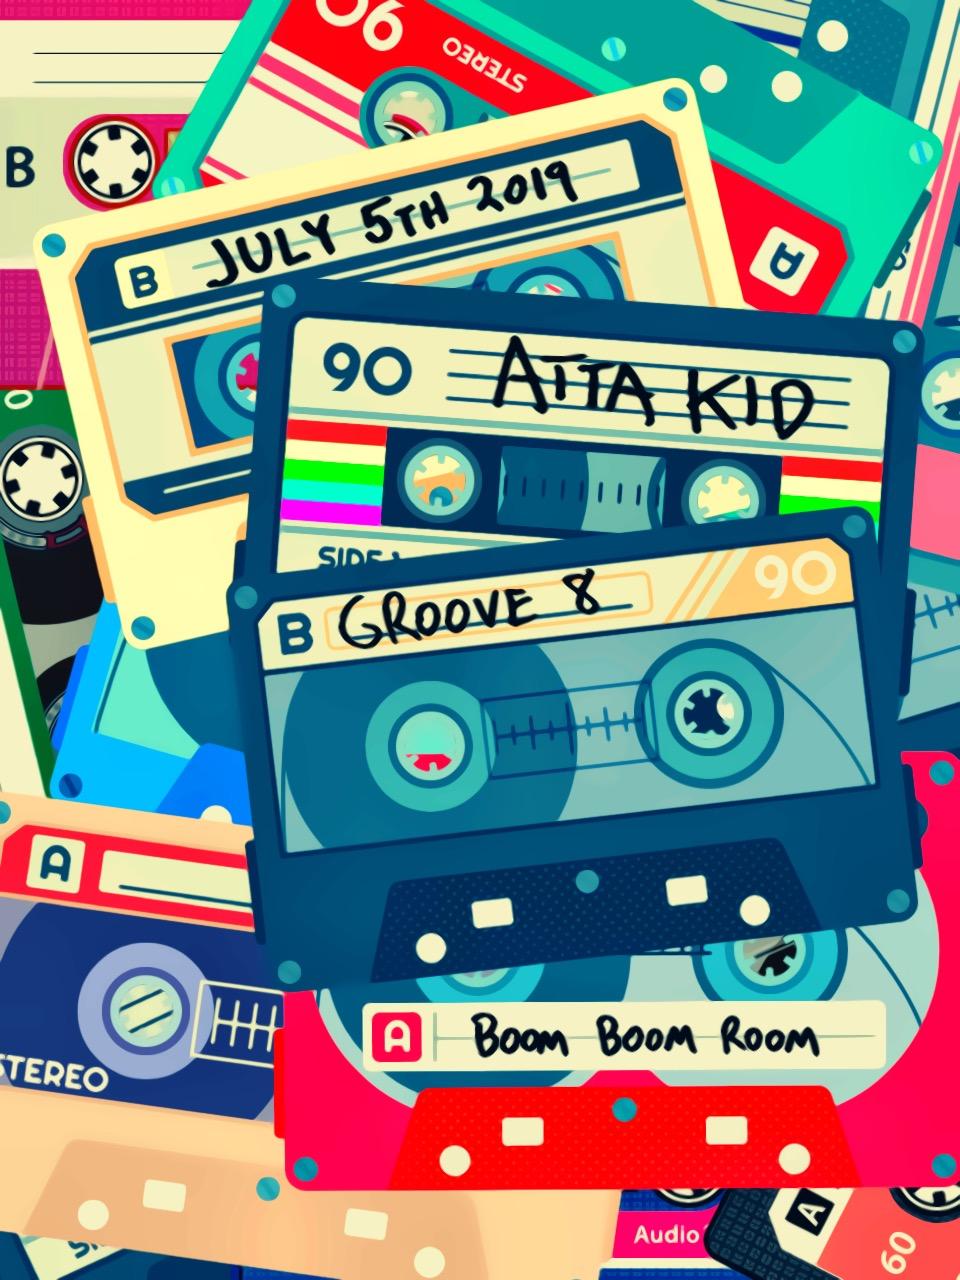 Atta Kid Groove 8 Boom Boom Room.JPG